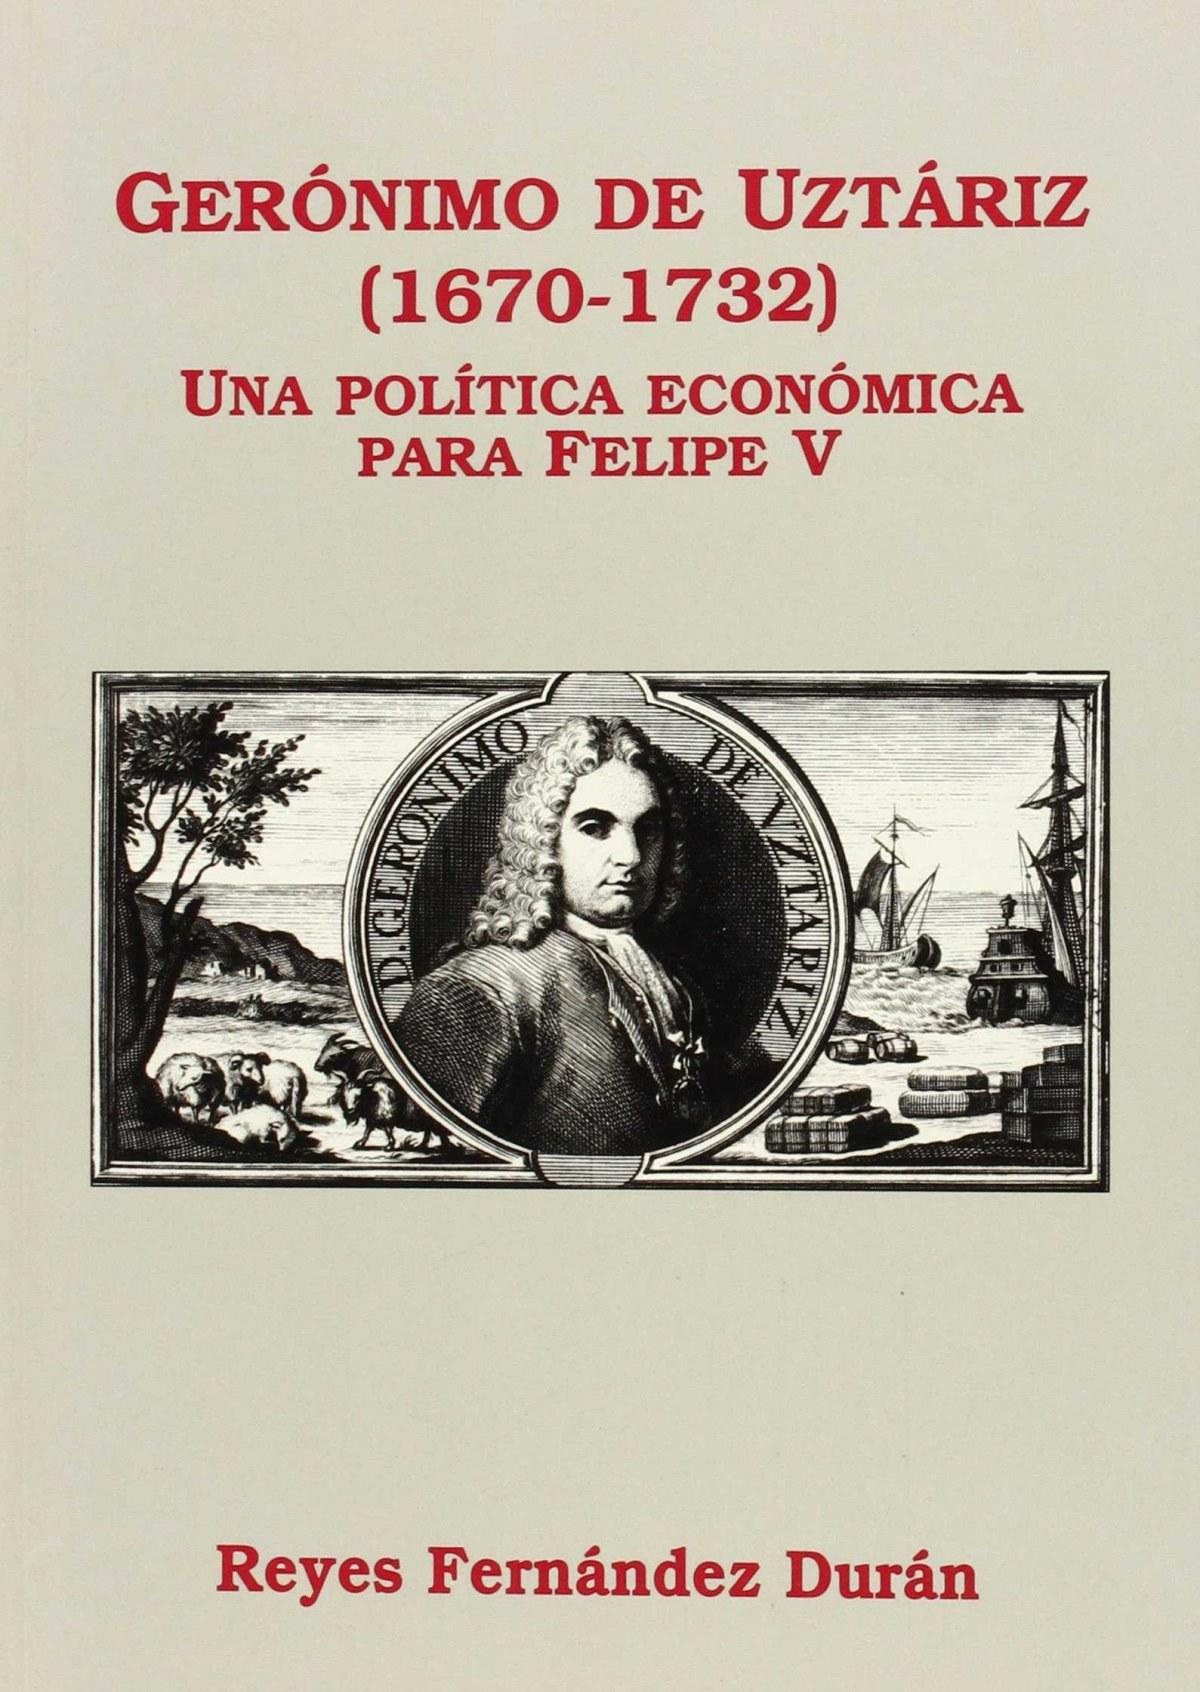 GERONIMO UZTARIZ (1670-1732)